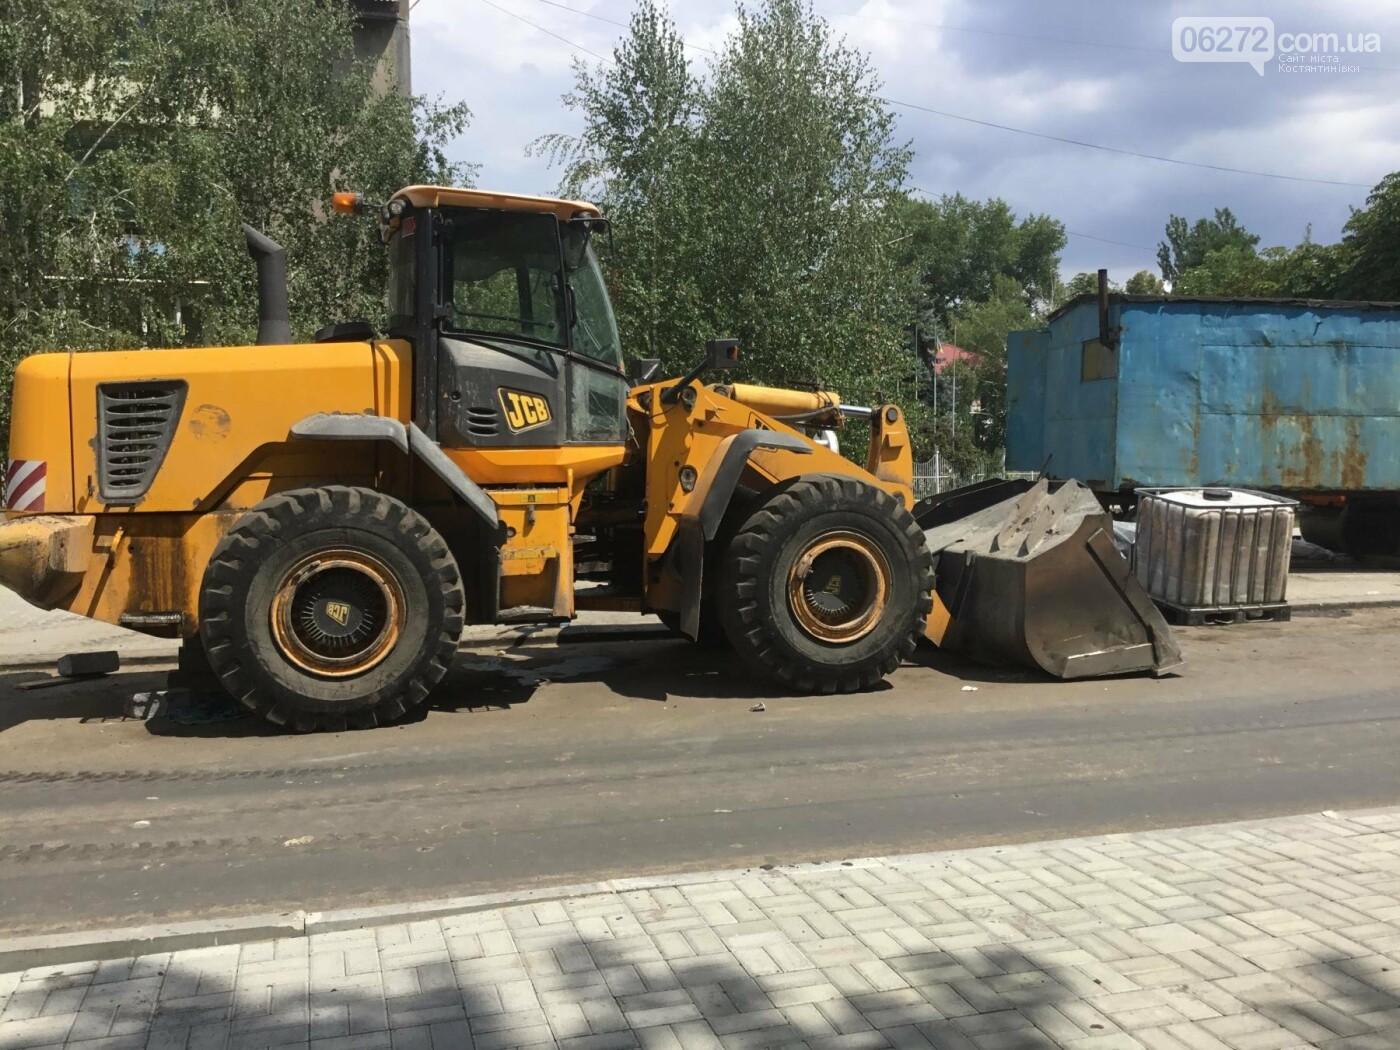 В Константиновке продолжают ремонт дорог, фото-8